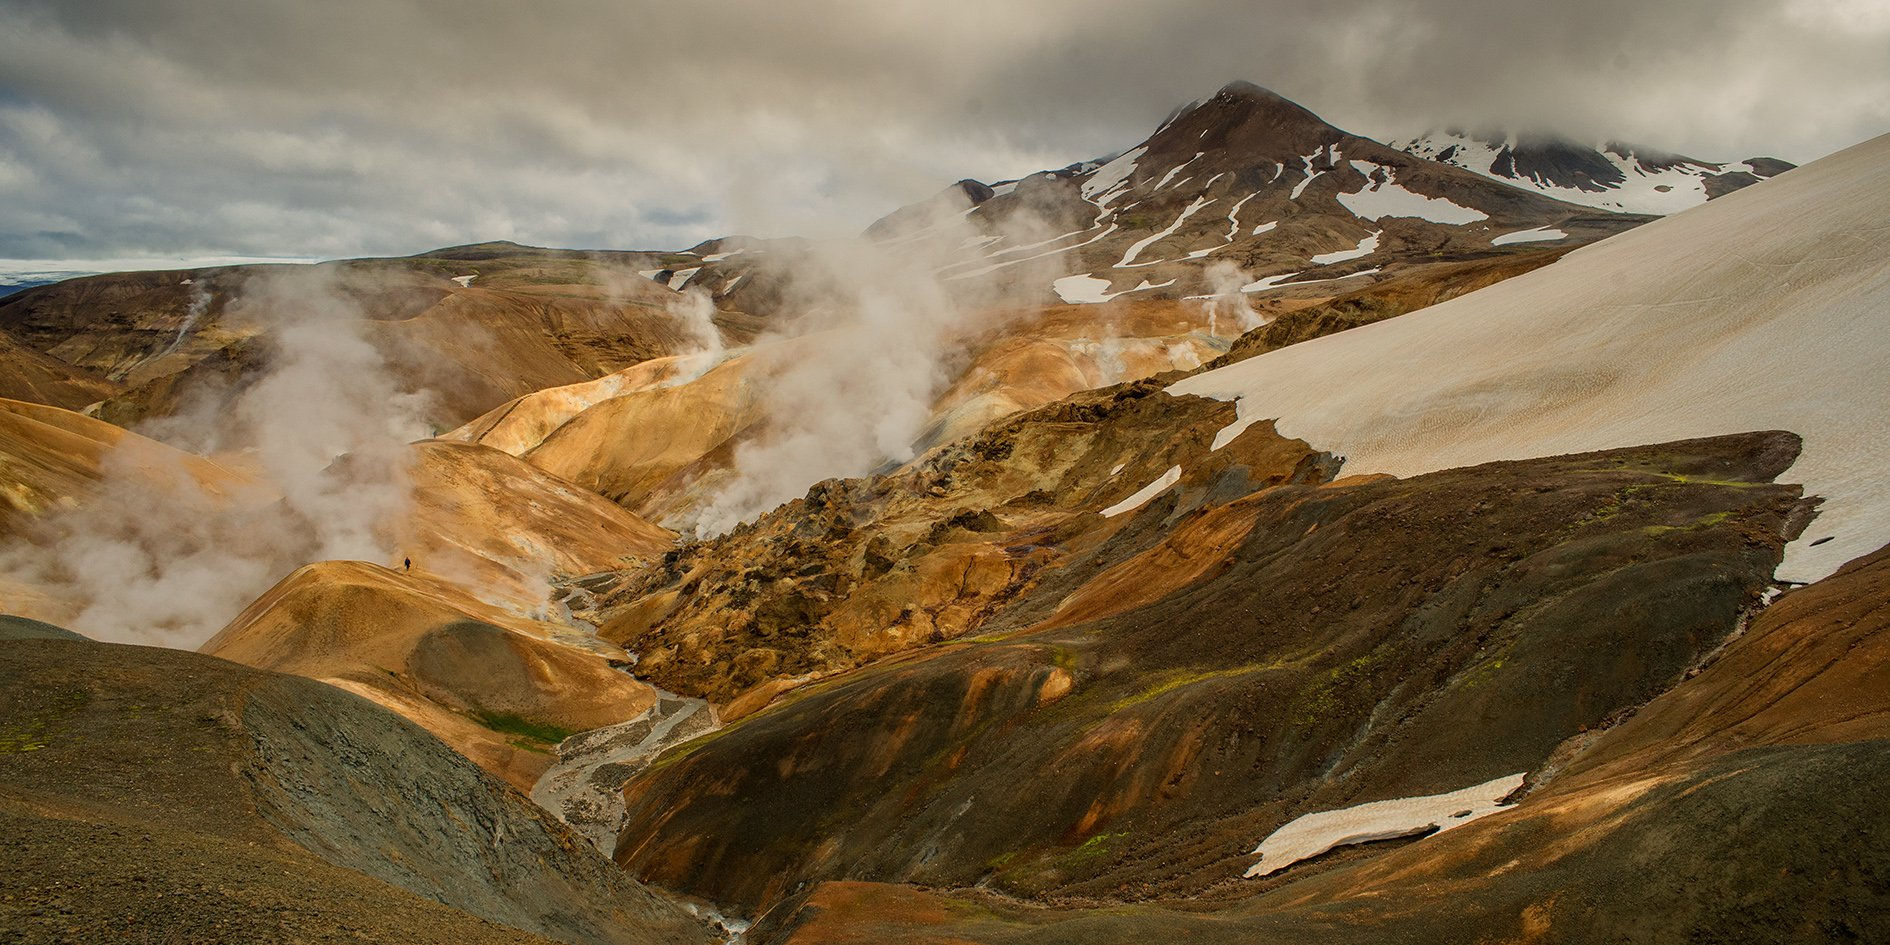 iceland, icelandic mountains, исландия, colorful mountains, цветные горы, Татьяна Ефименко